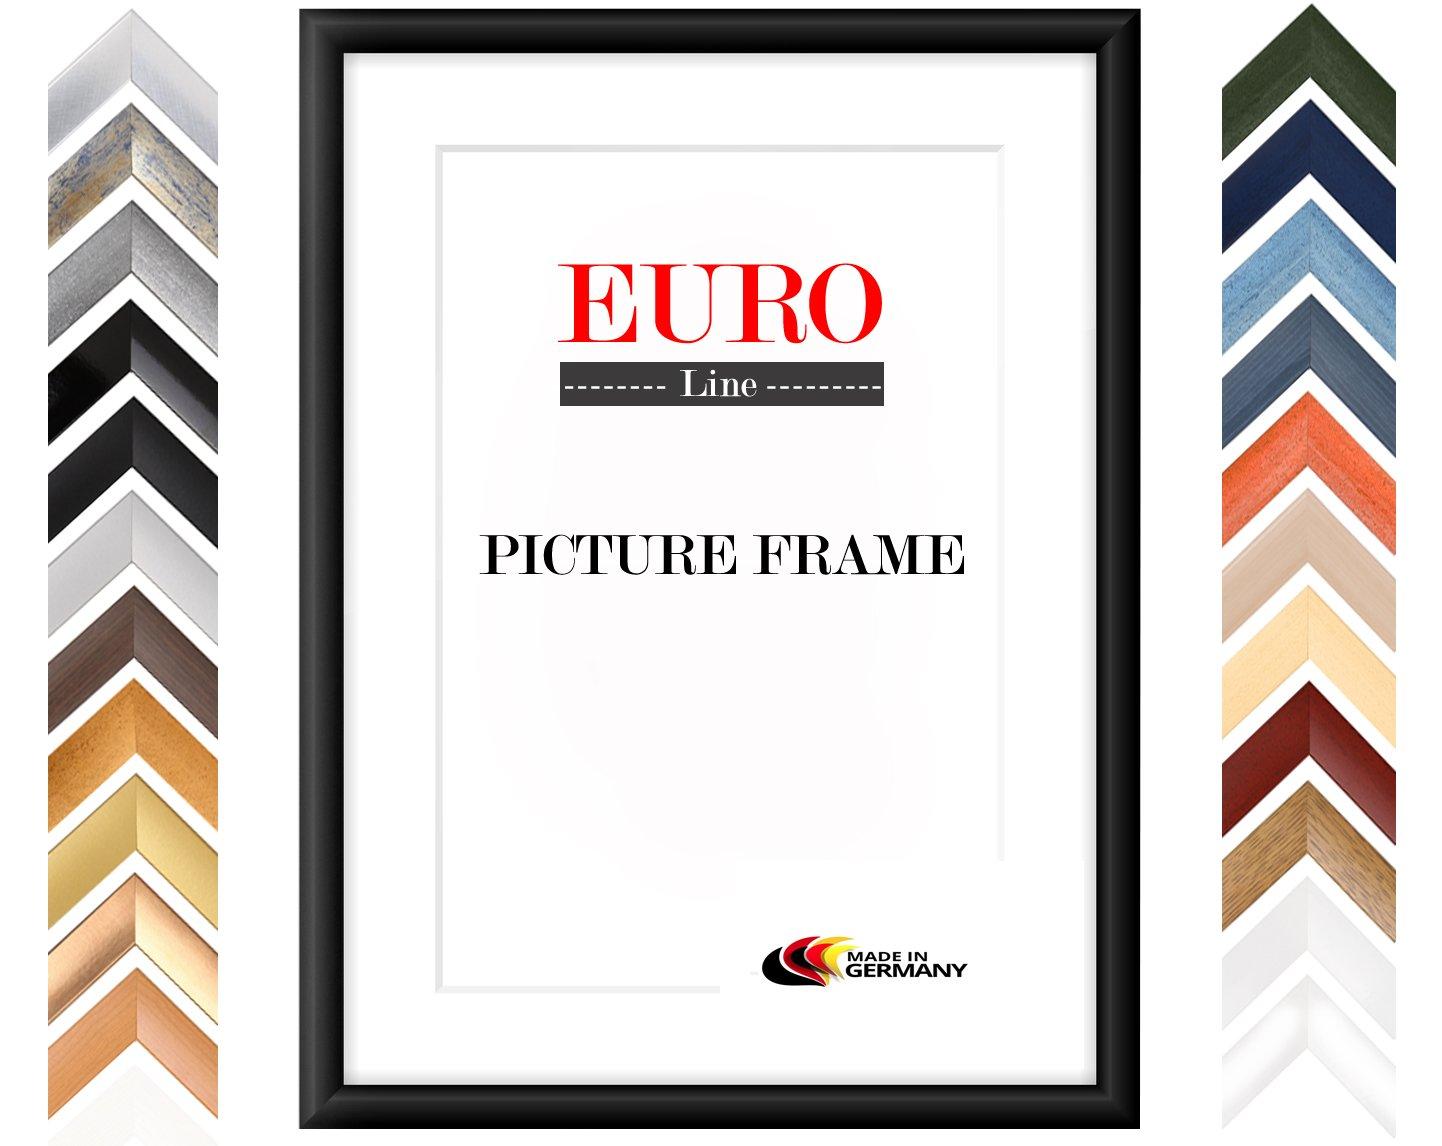 Amazon.de: EUROLine35 Bilderrahmen im Puzzleformat für 75 cm x 98 cm ...